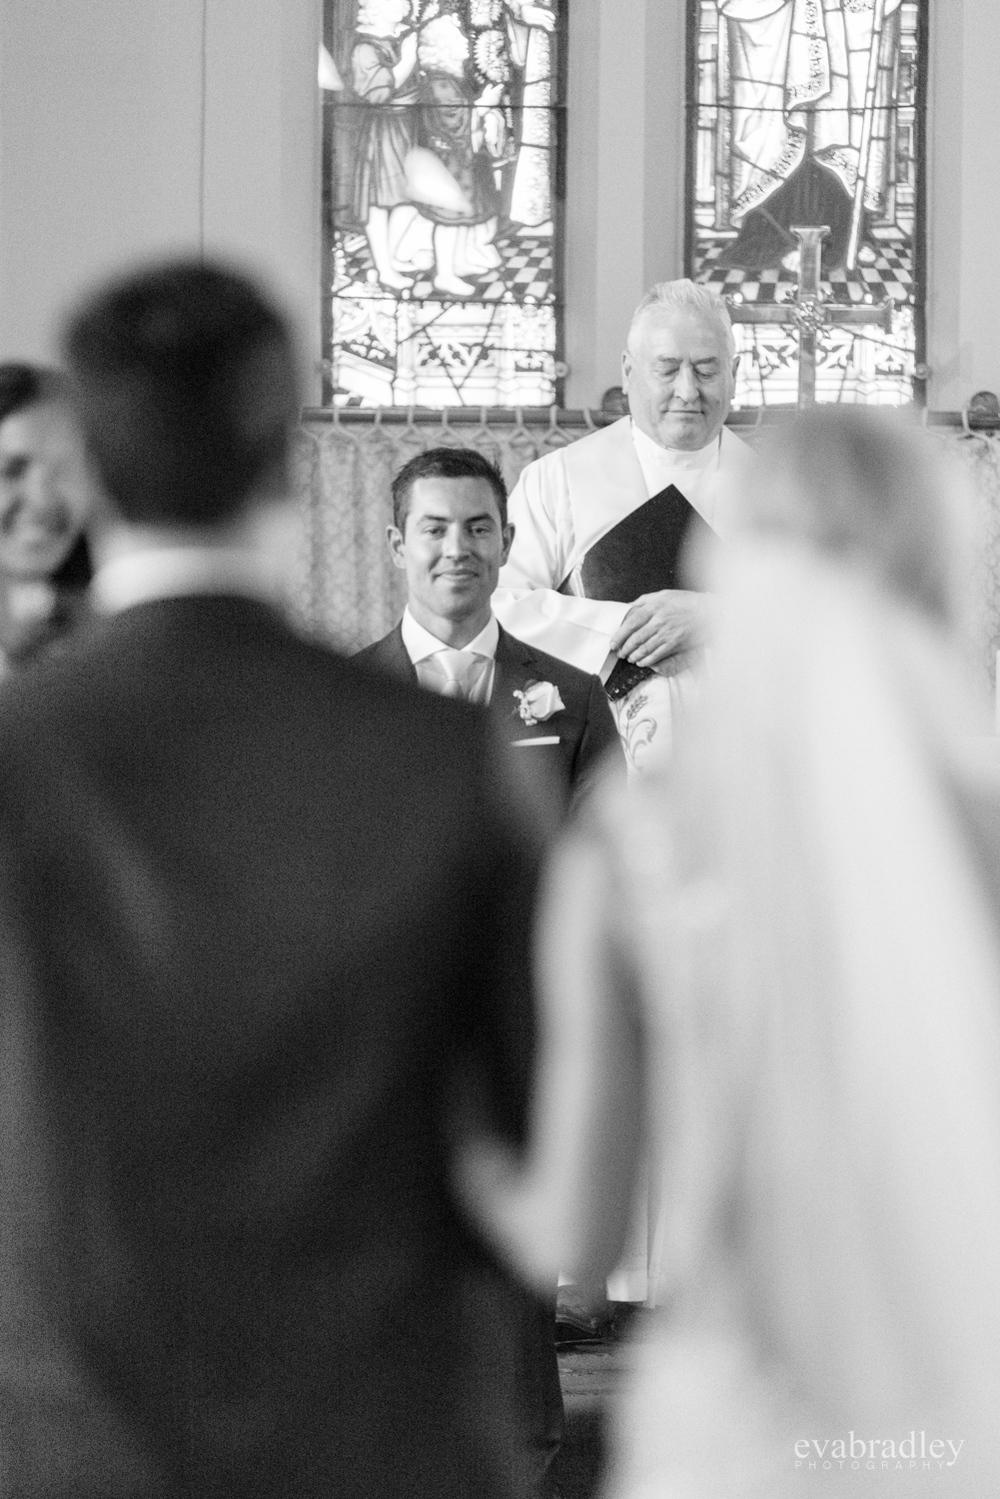 hawkes-bay-wedding-venues-the-mission-18.jpg